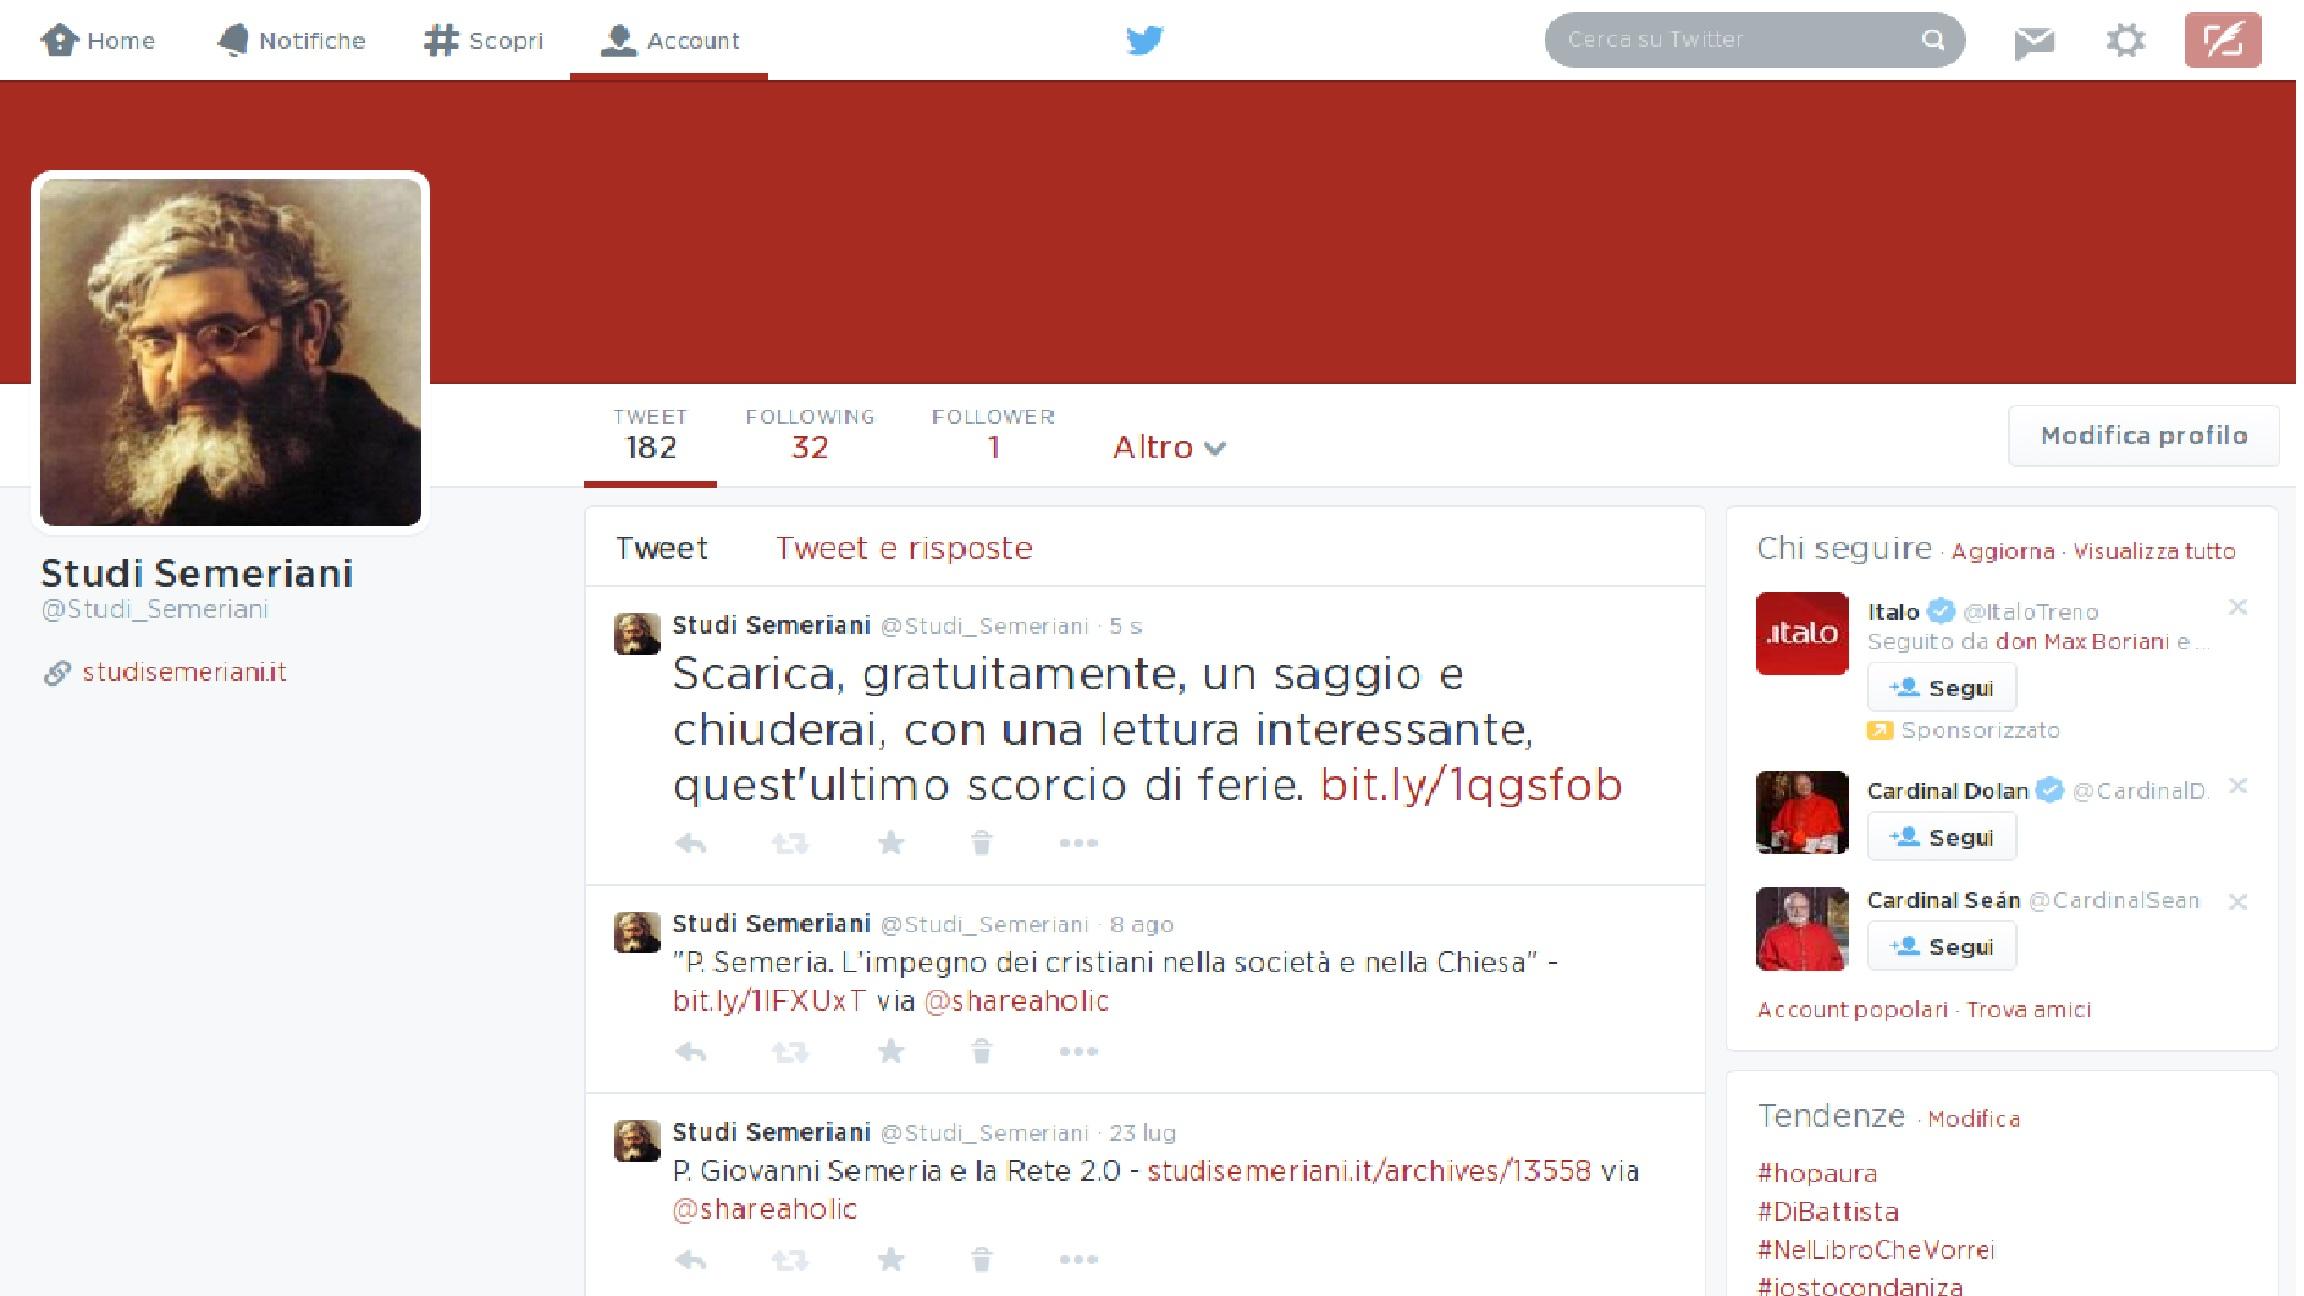 Studi Semeriani: account Twitter